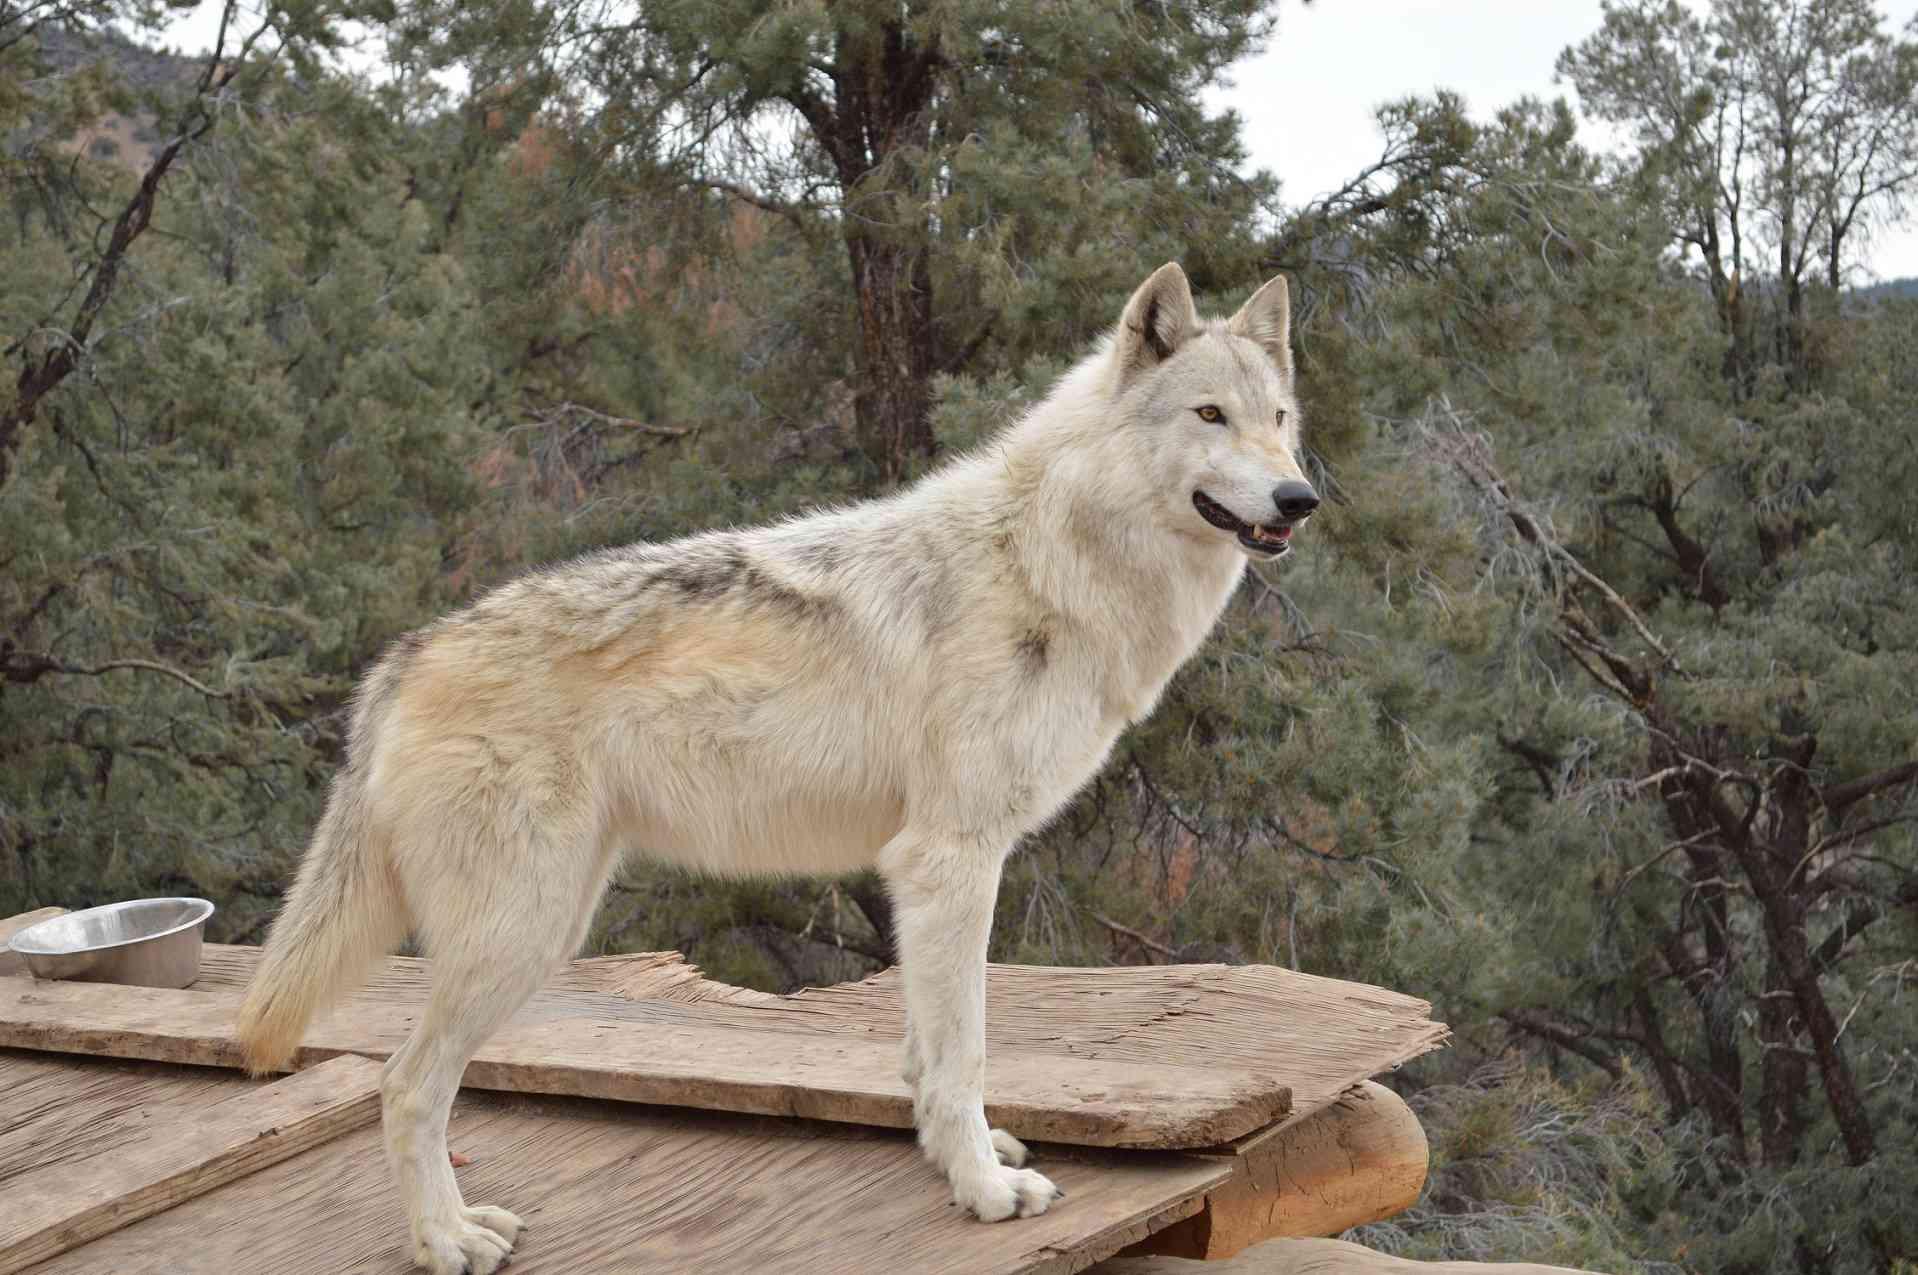 Rescued wolfdog at LARC